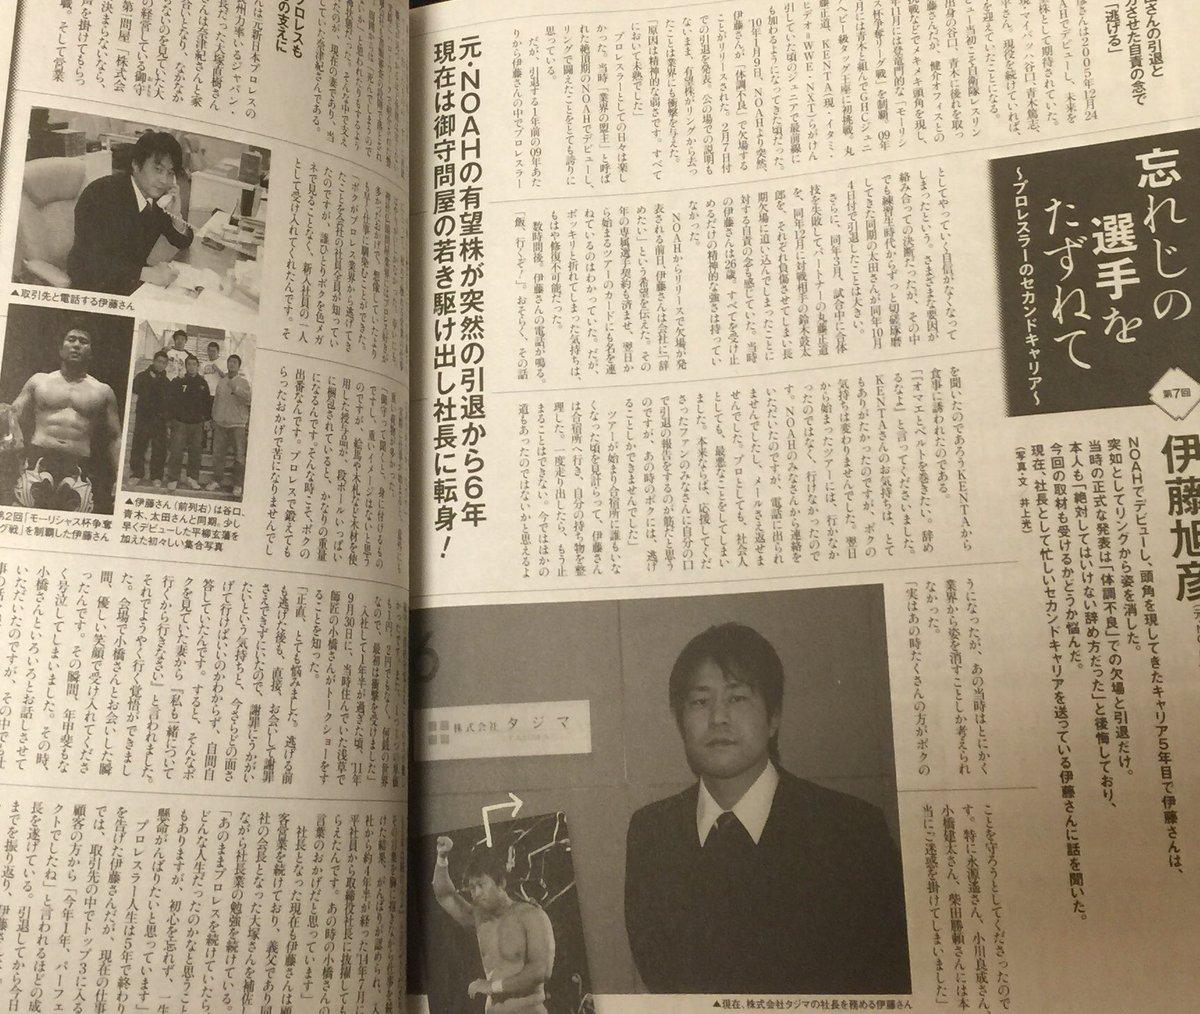 小橋建太 (KENTA KOBASHI) on Tw...